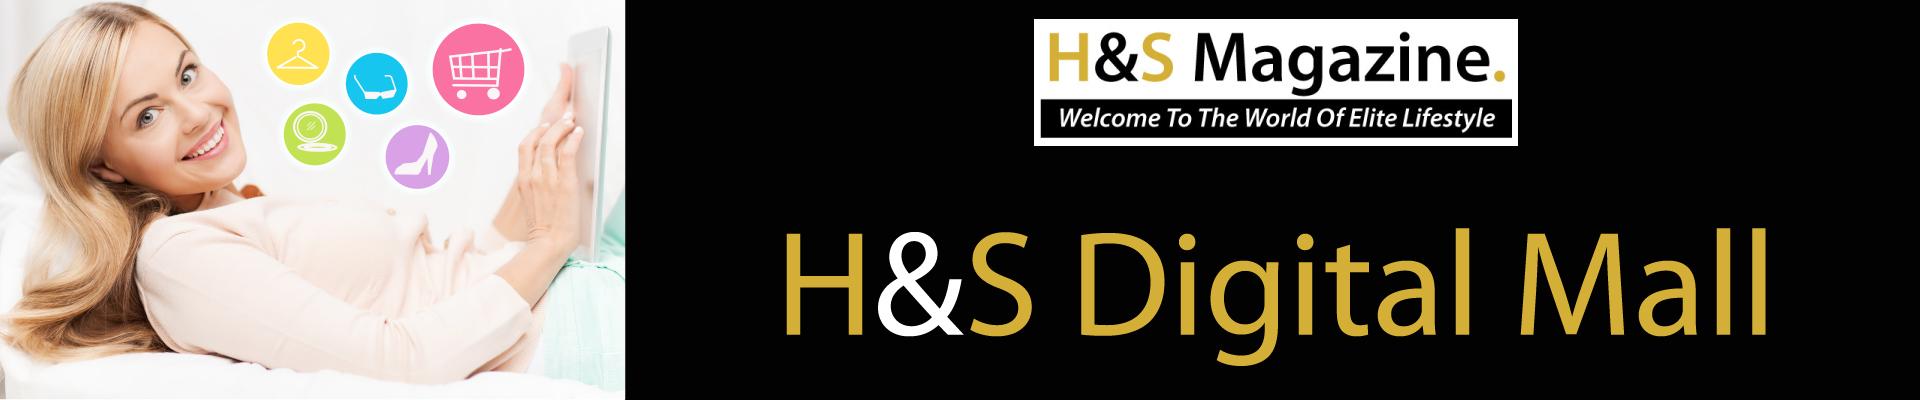 H&S Magazine Digital Mall